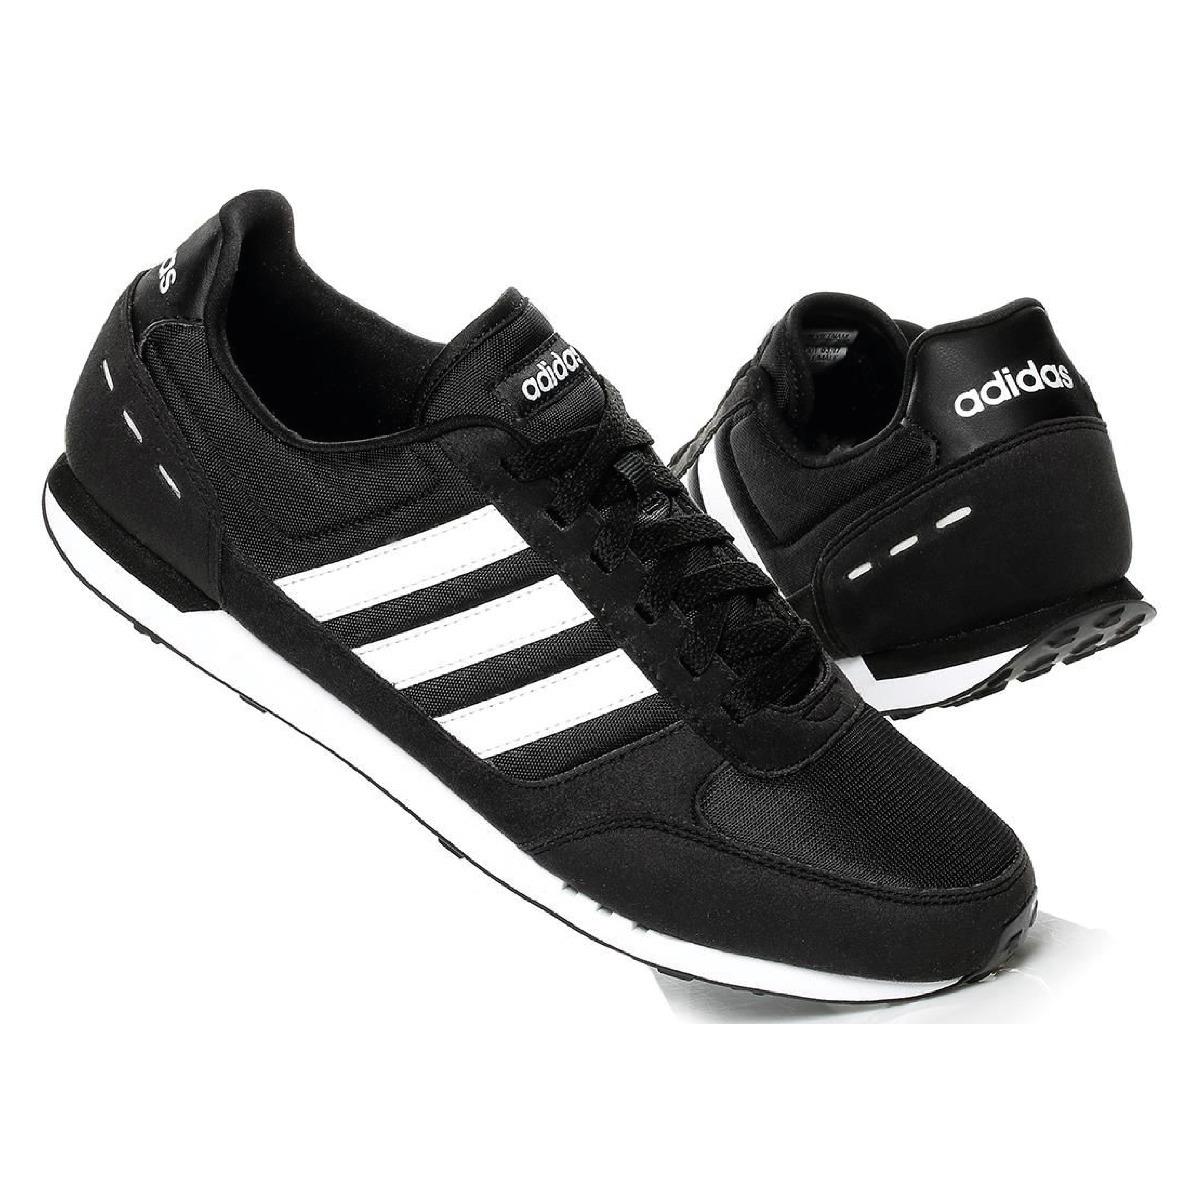 Adidas Tenis Adidas Neo City Racer Textil Negro Textil